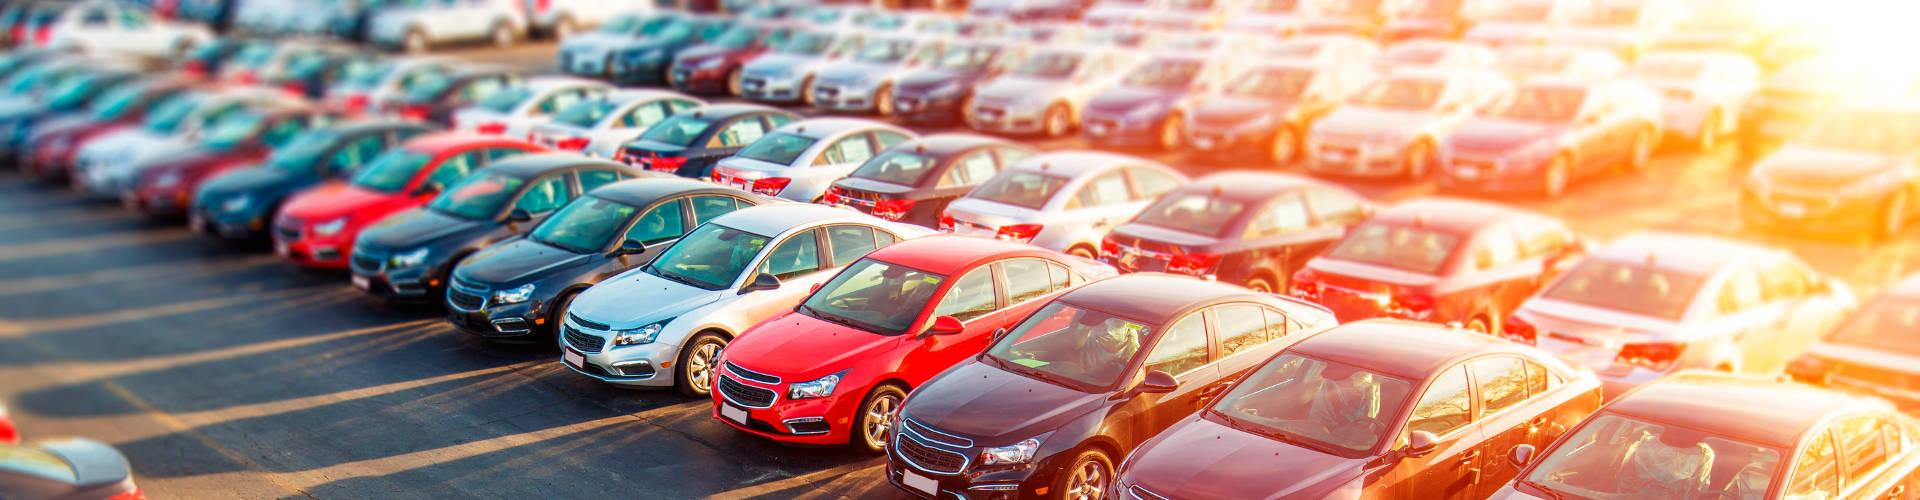 6 Dicas para comprar o carro usado perfeito, Fernandes Consórcios